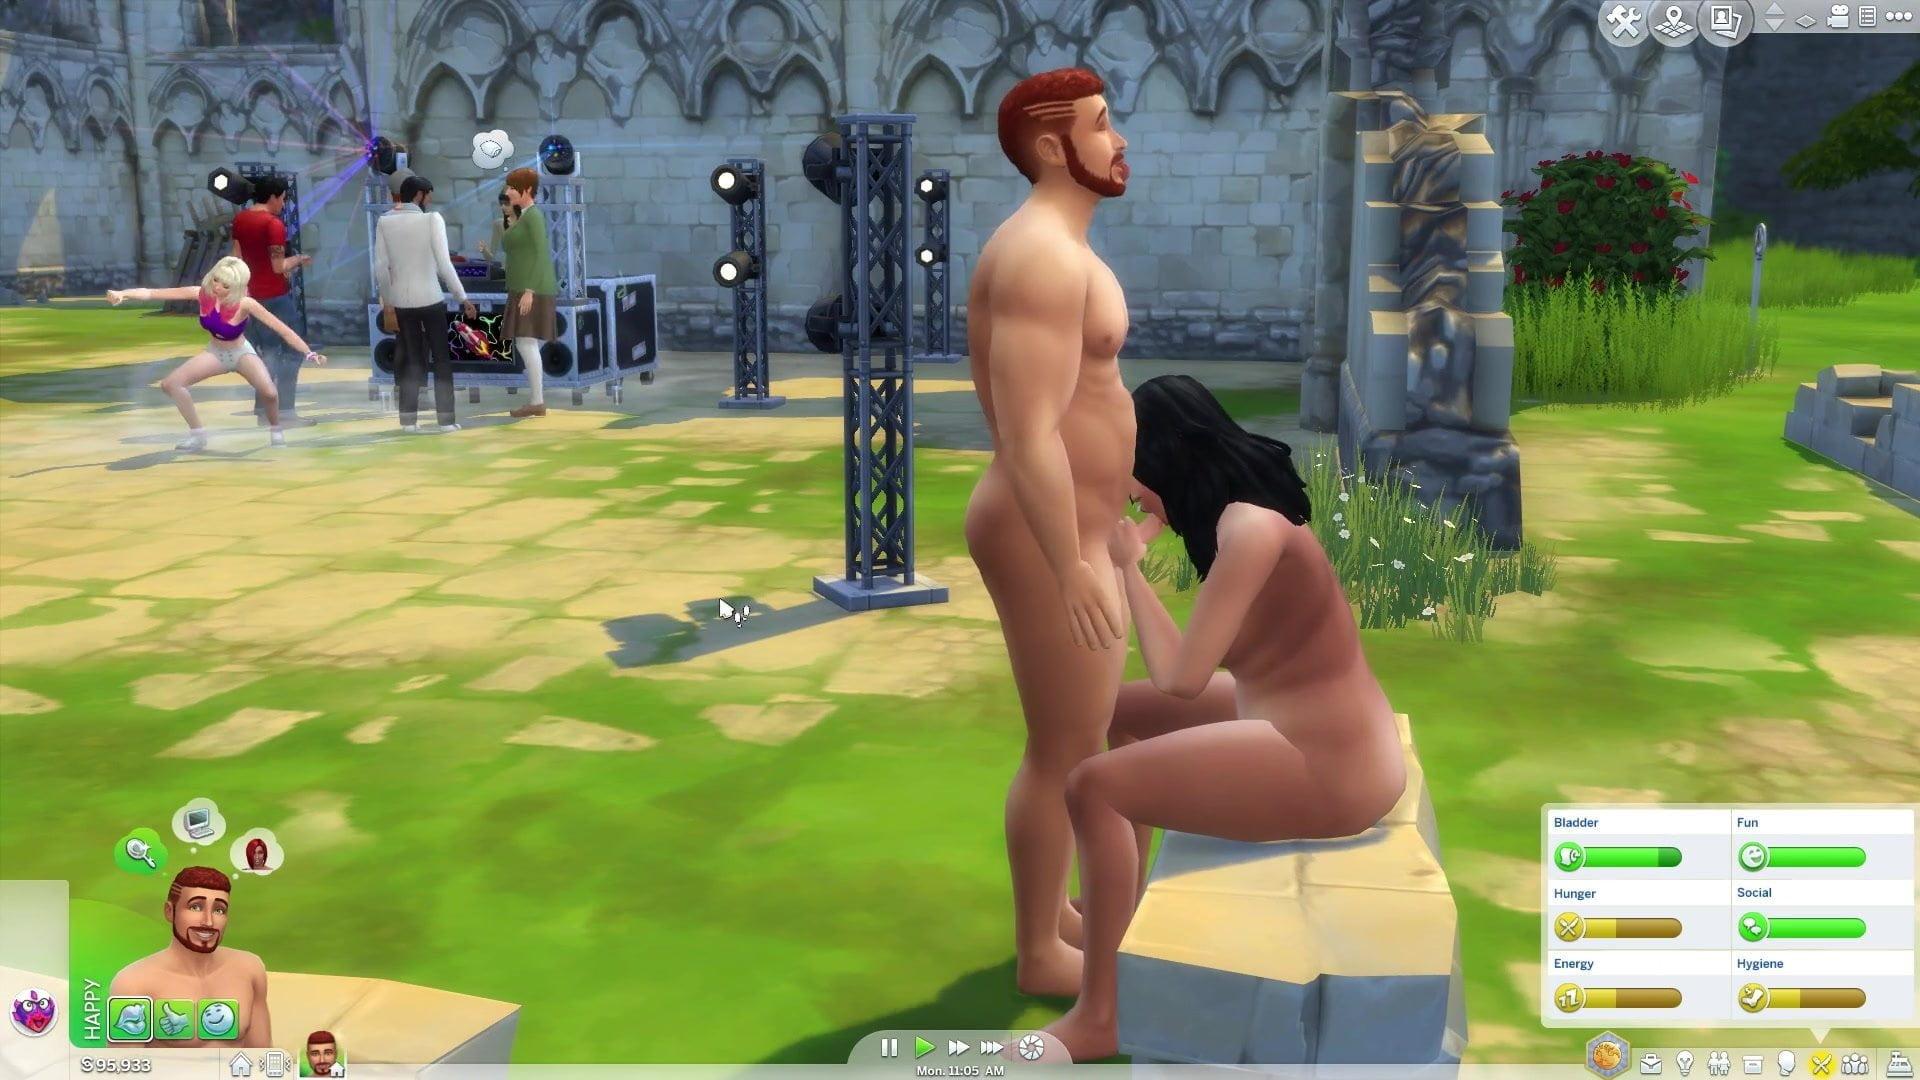 Actrices Porno Los Sims4 sims 4 public sex